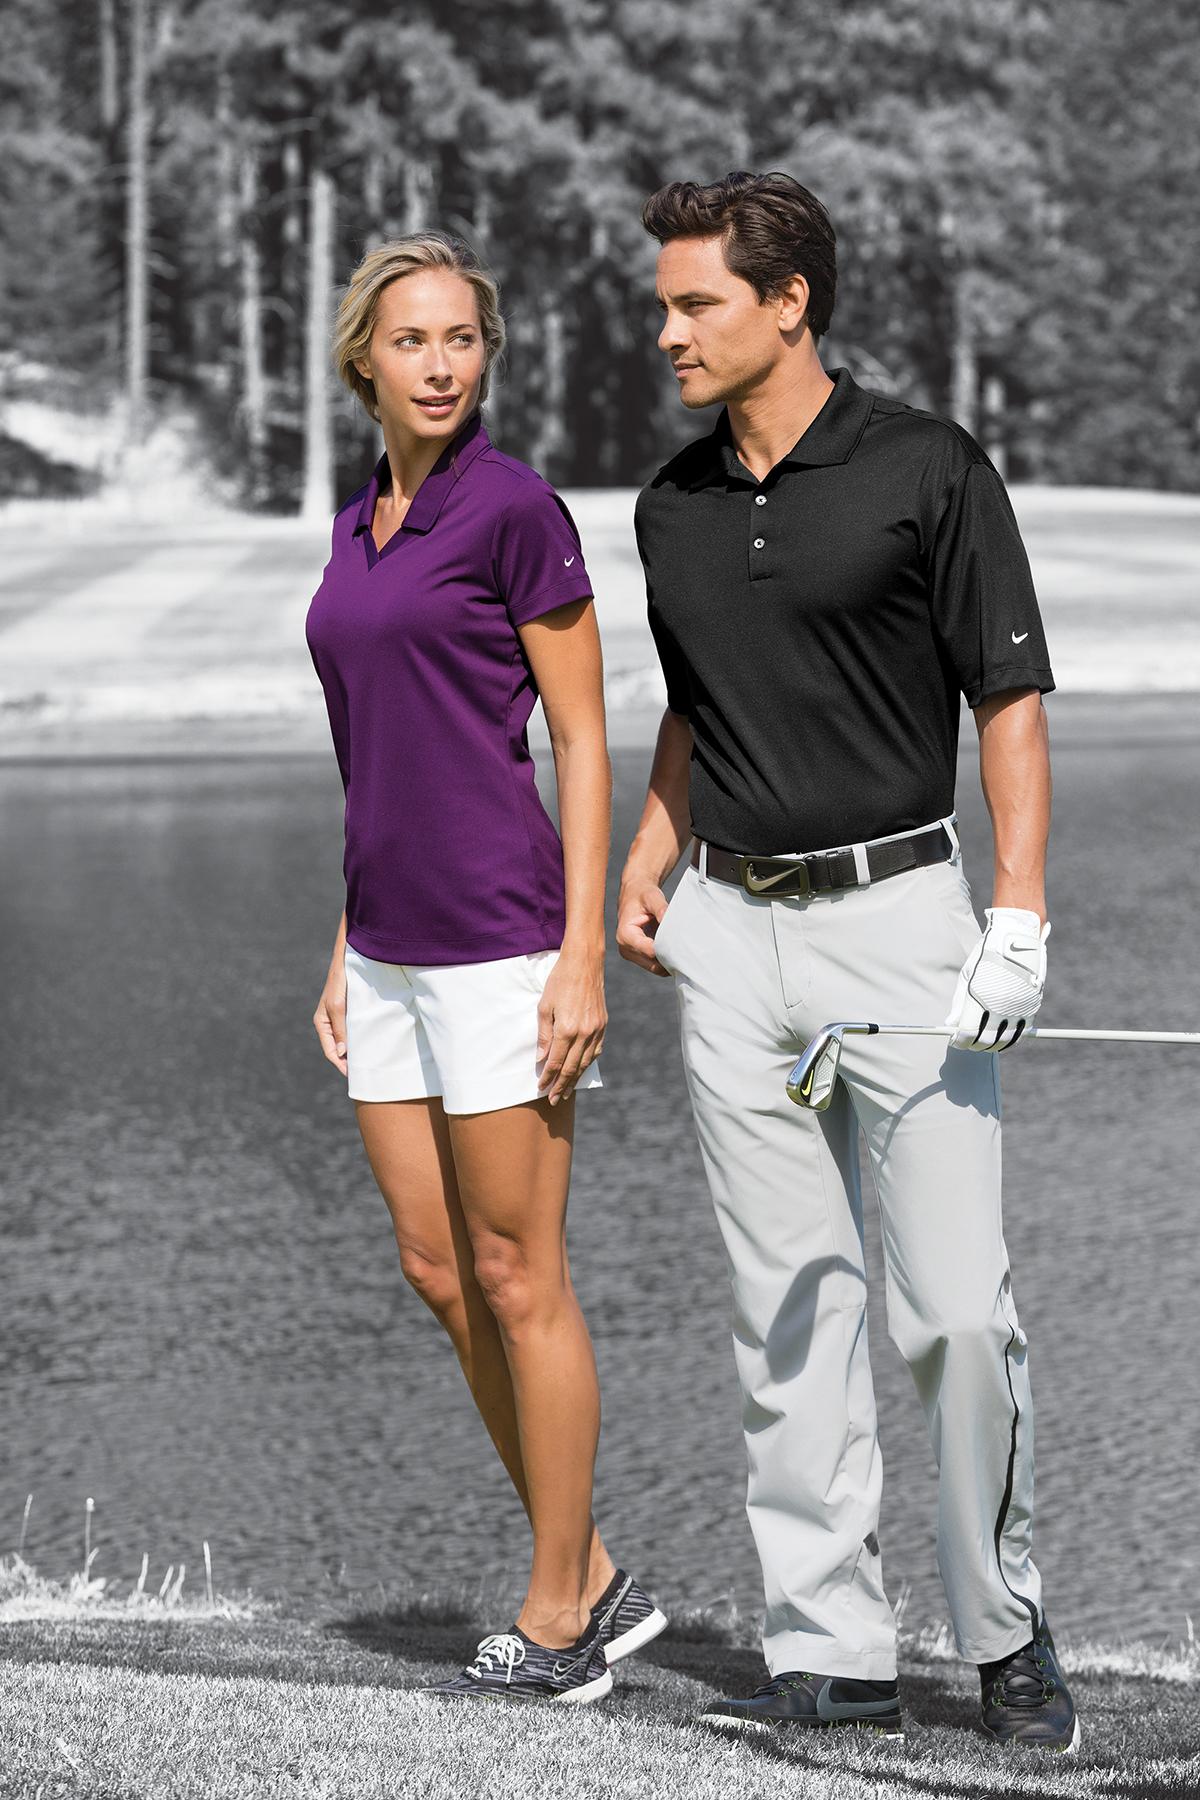 caedefee 363807 Nike Dri-FIT Micro Pique Polo mens & ladies plus tall sizes